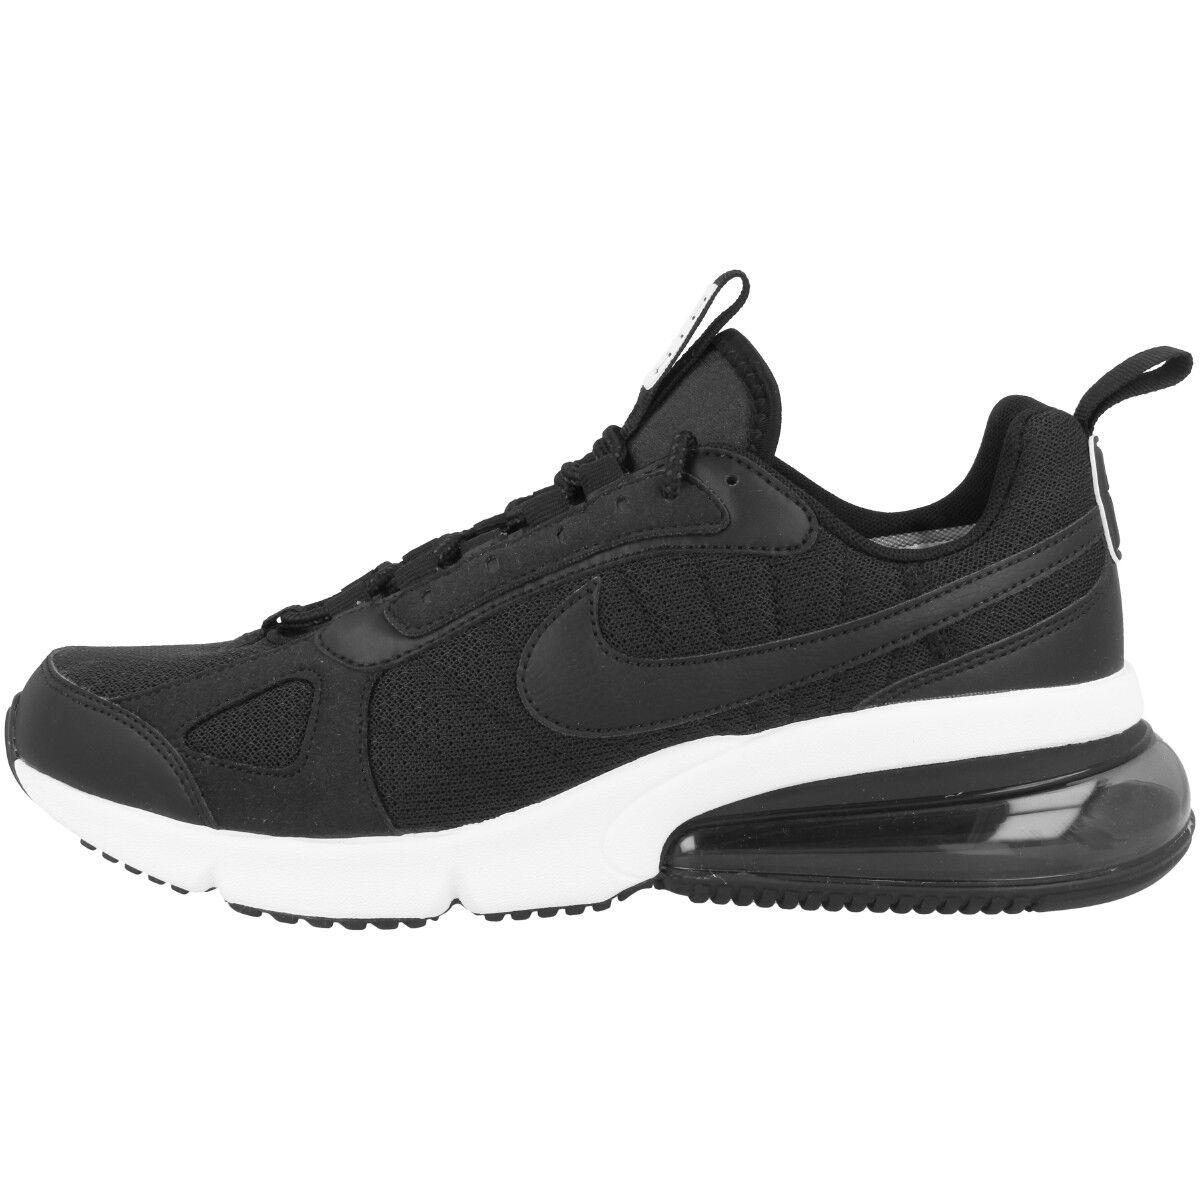 Nike Schuhe Air Max 270 Futura Schuhe Nike Freizeit Sneaker Laufschuhe schwarz AO1569-001 4f2a58